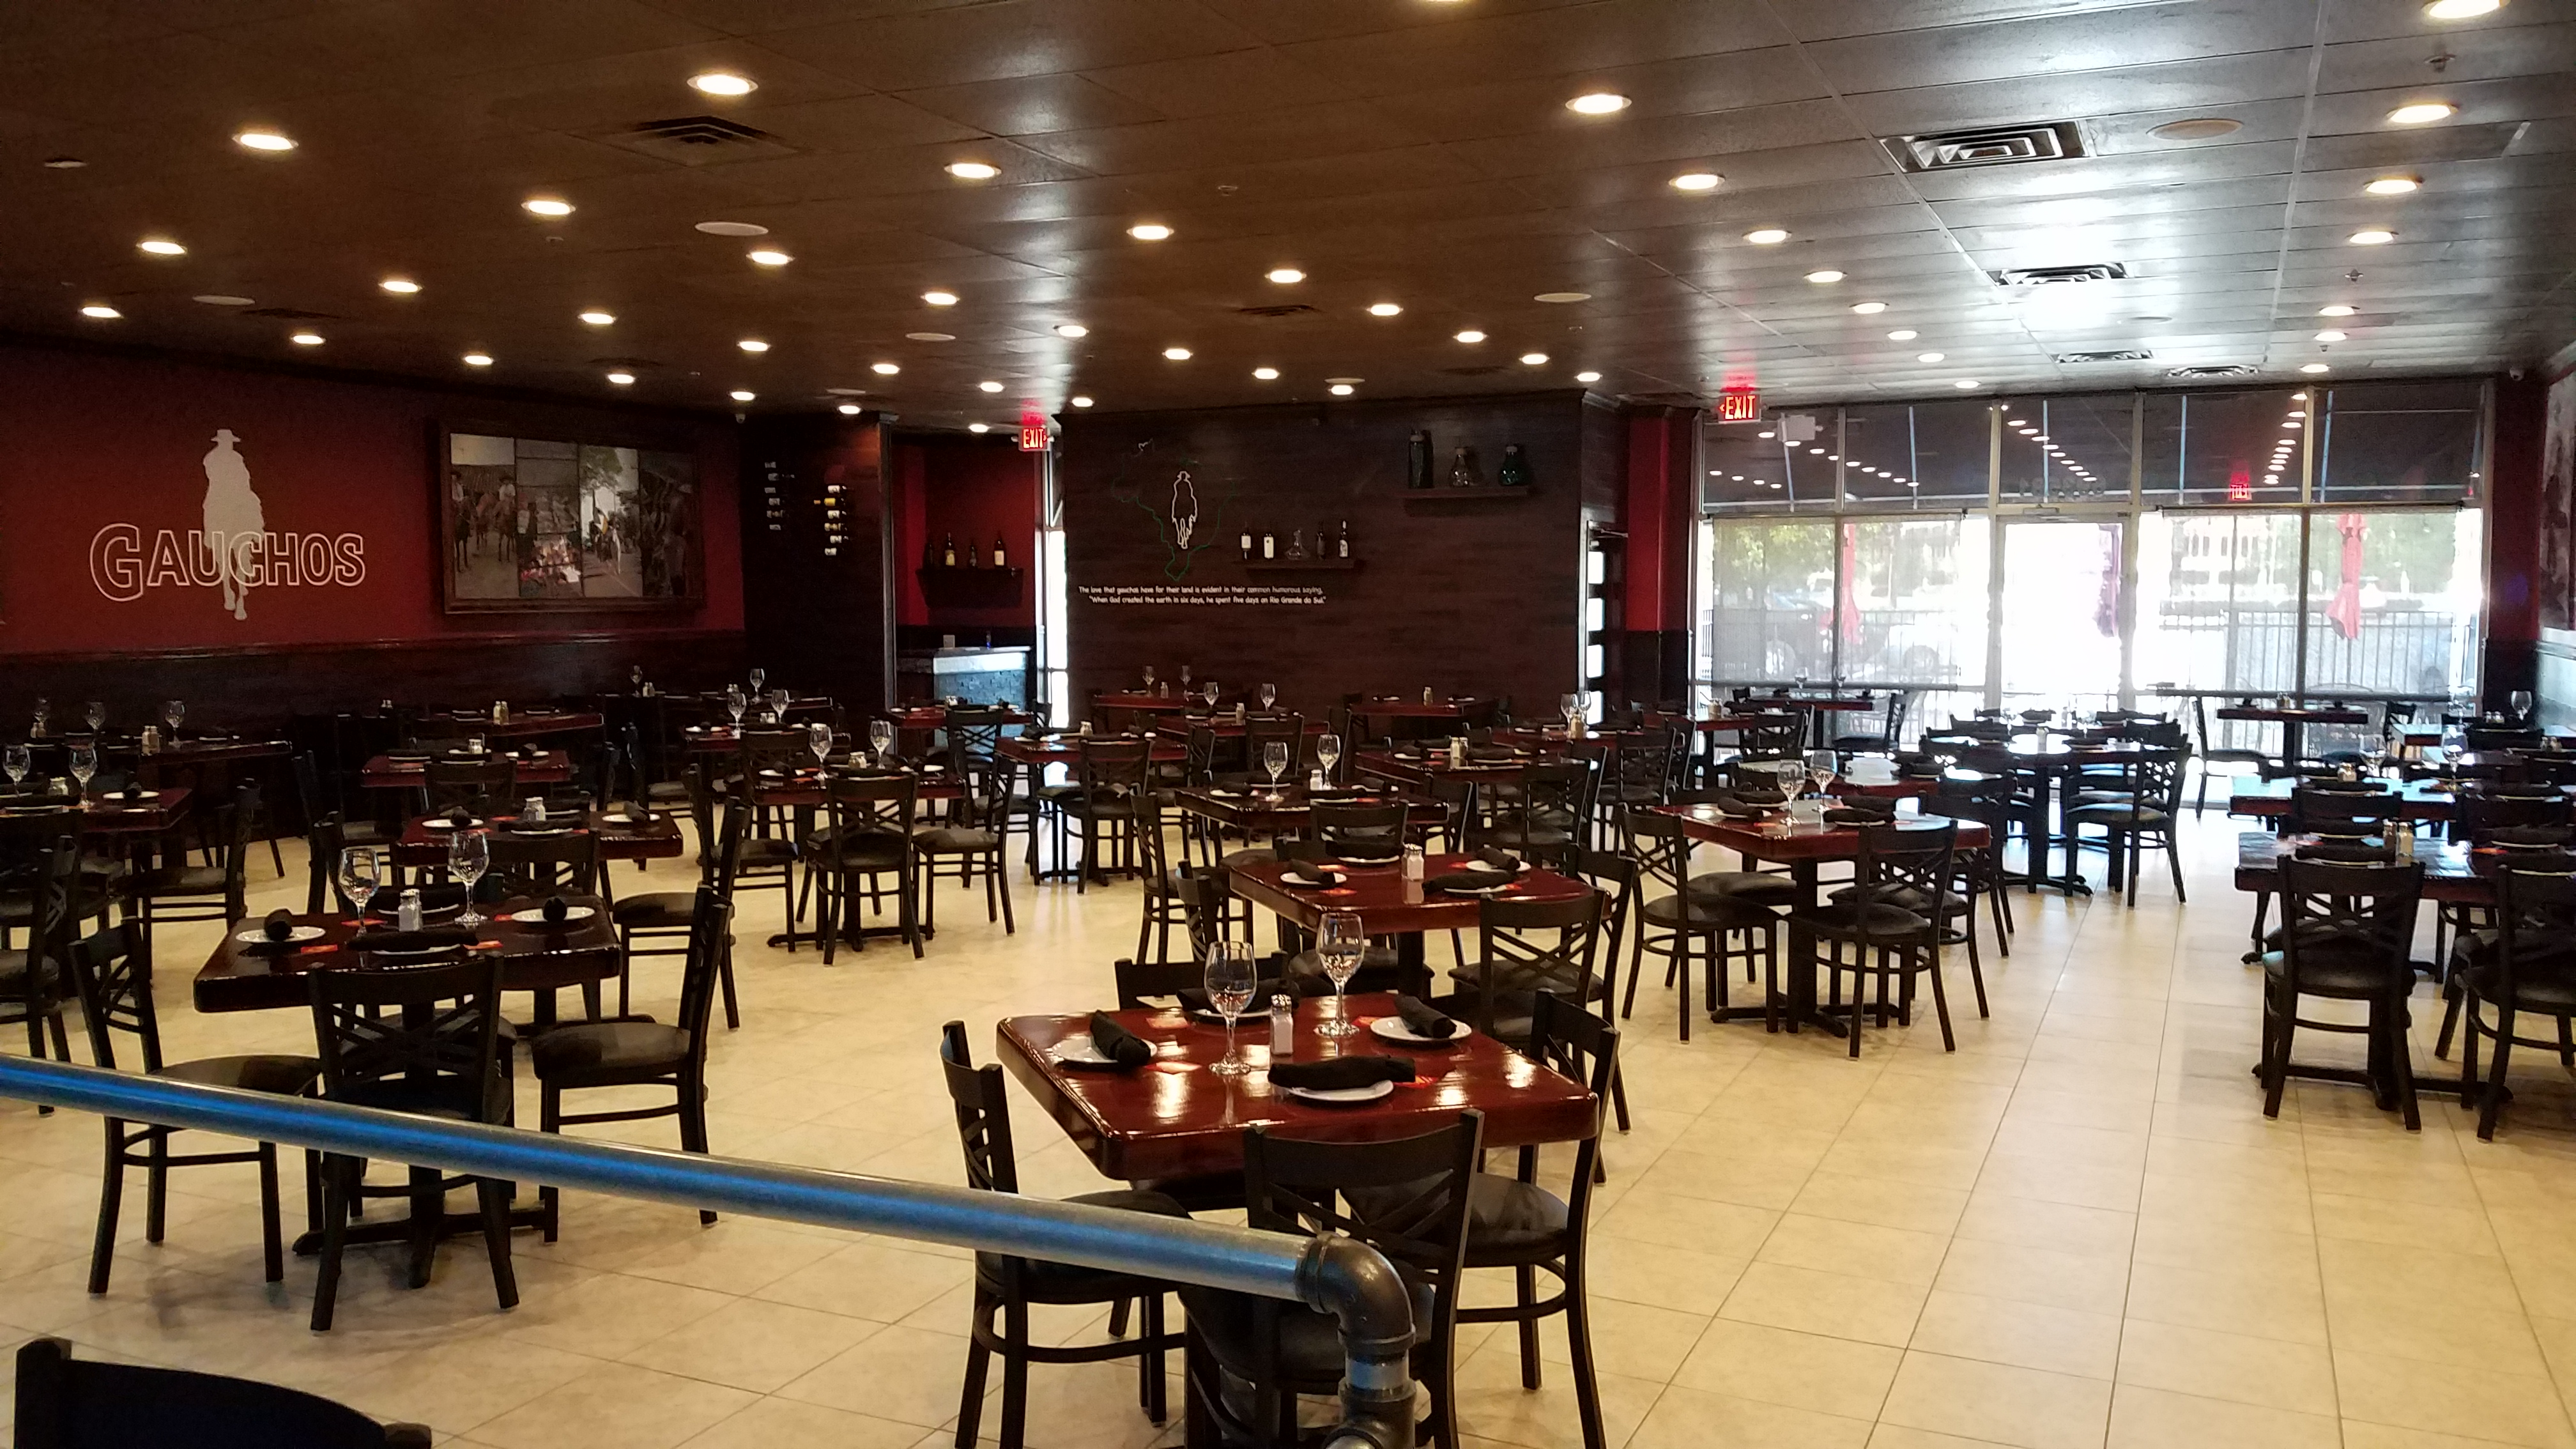 Gauchos Brazilian Steakhouse image 2